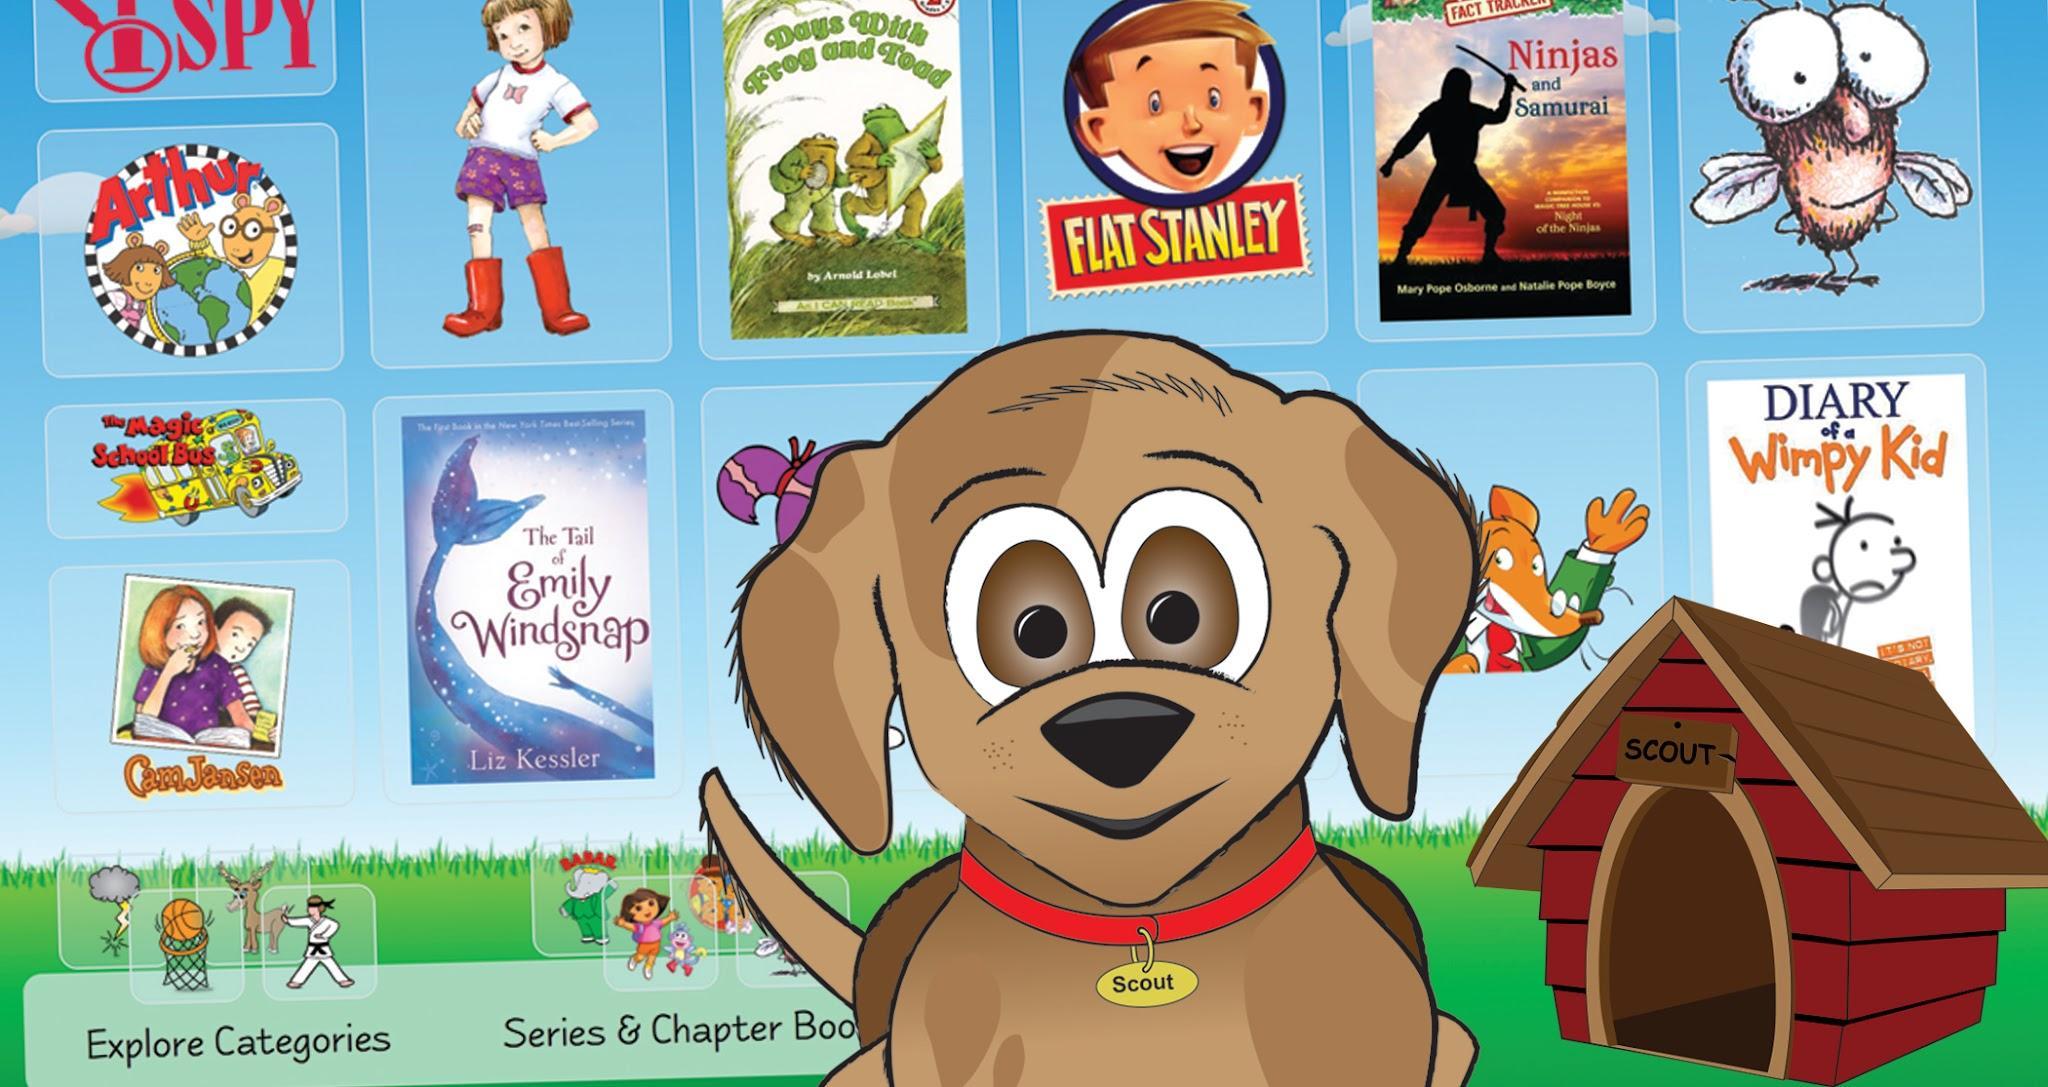 Scout, the LS2 Kids mascot